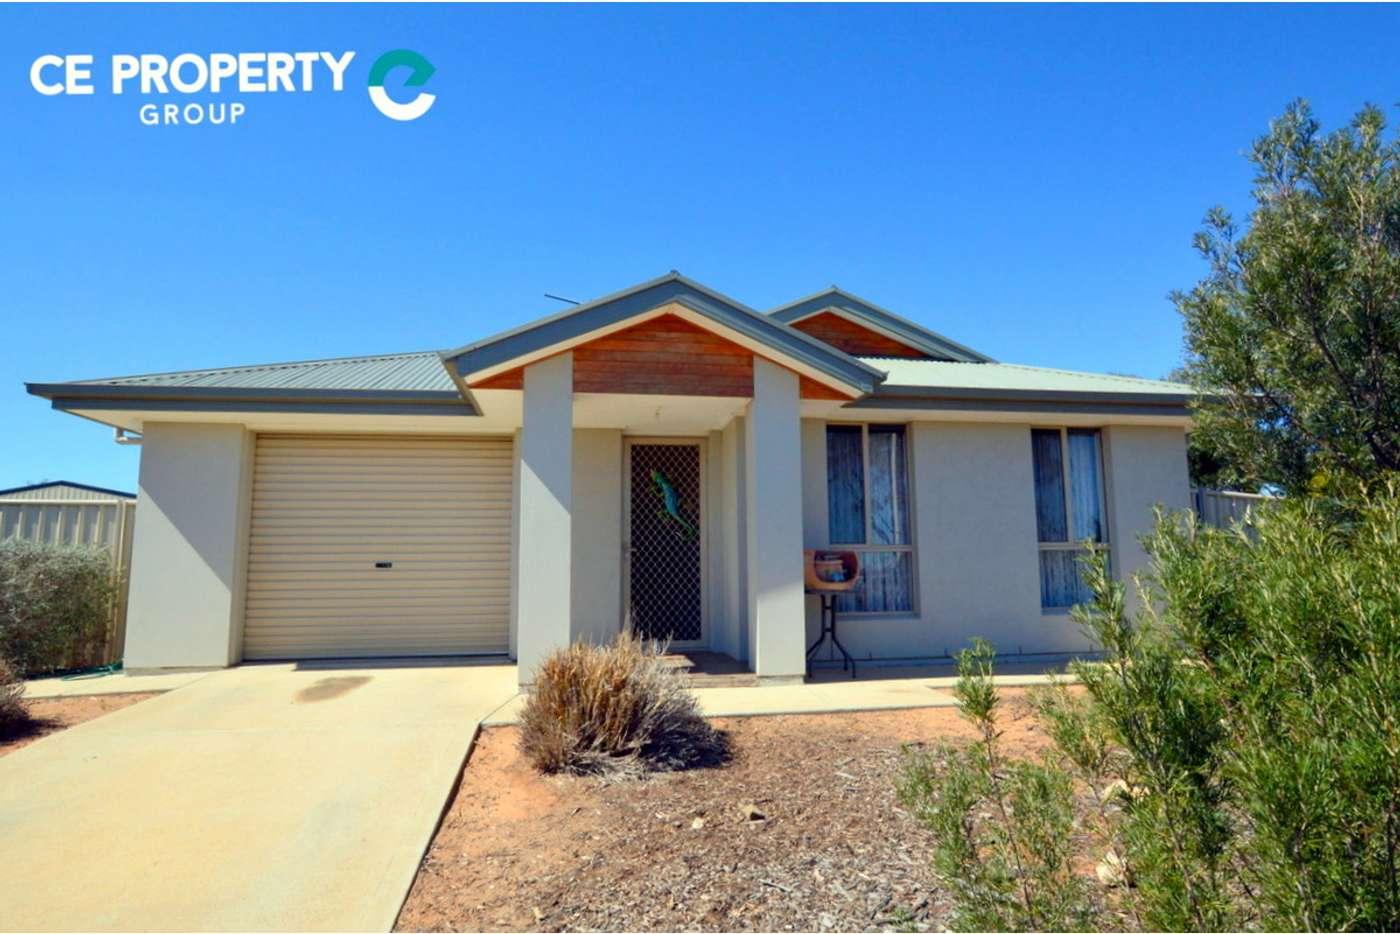 Main view of Homely house listing, 89 Sickerdick Street, Mannum SA 5238